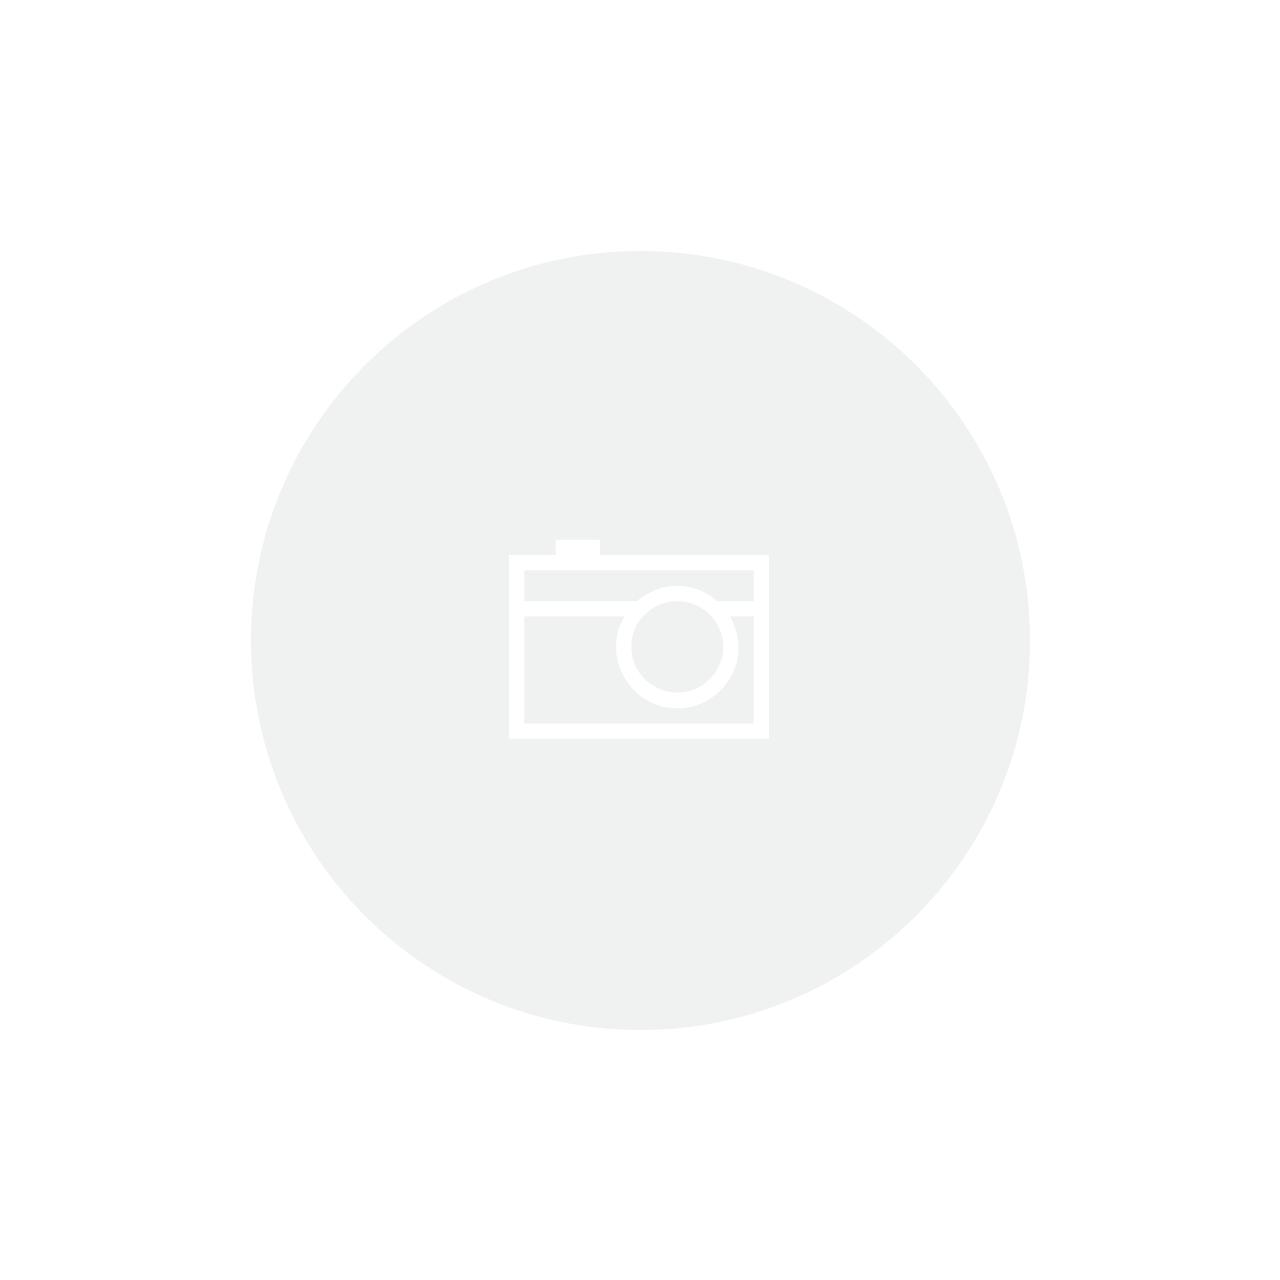 Papel Artesanal Indiano - Ref. 95